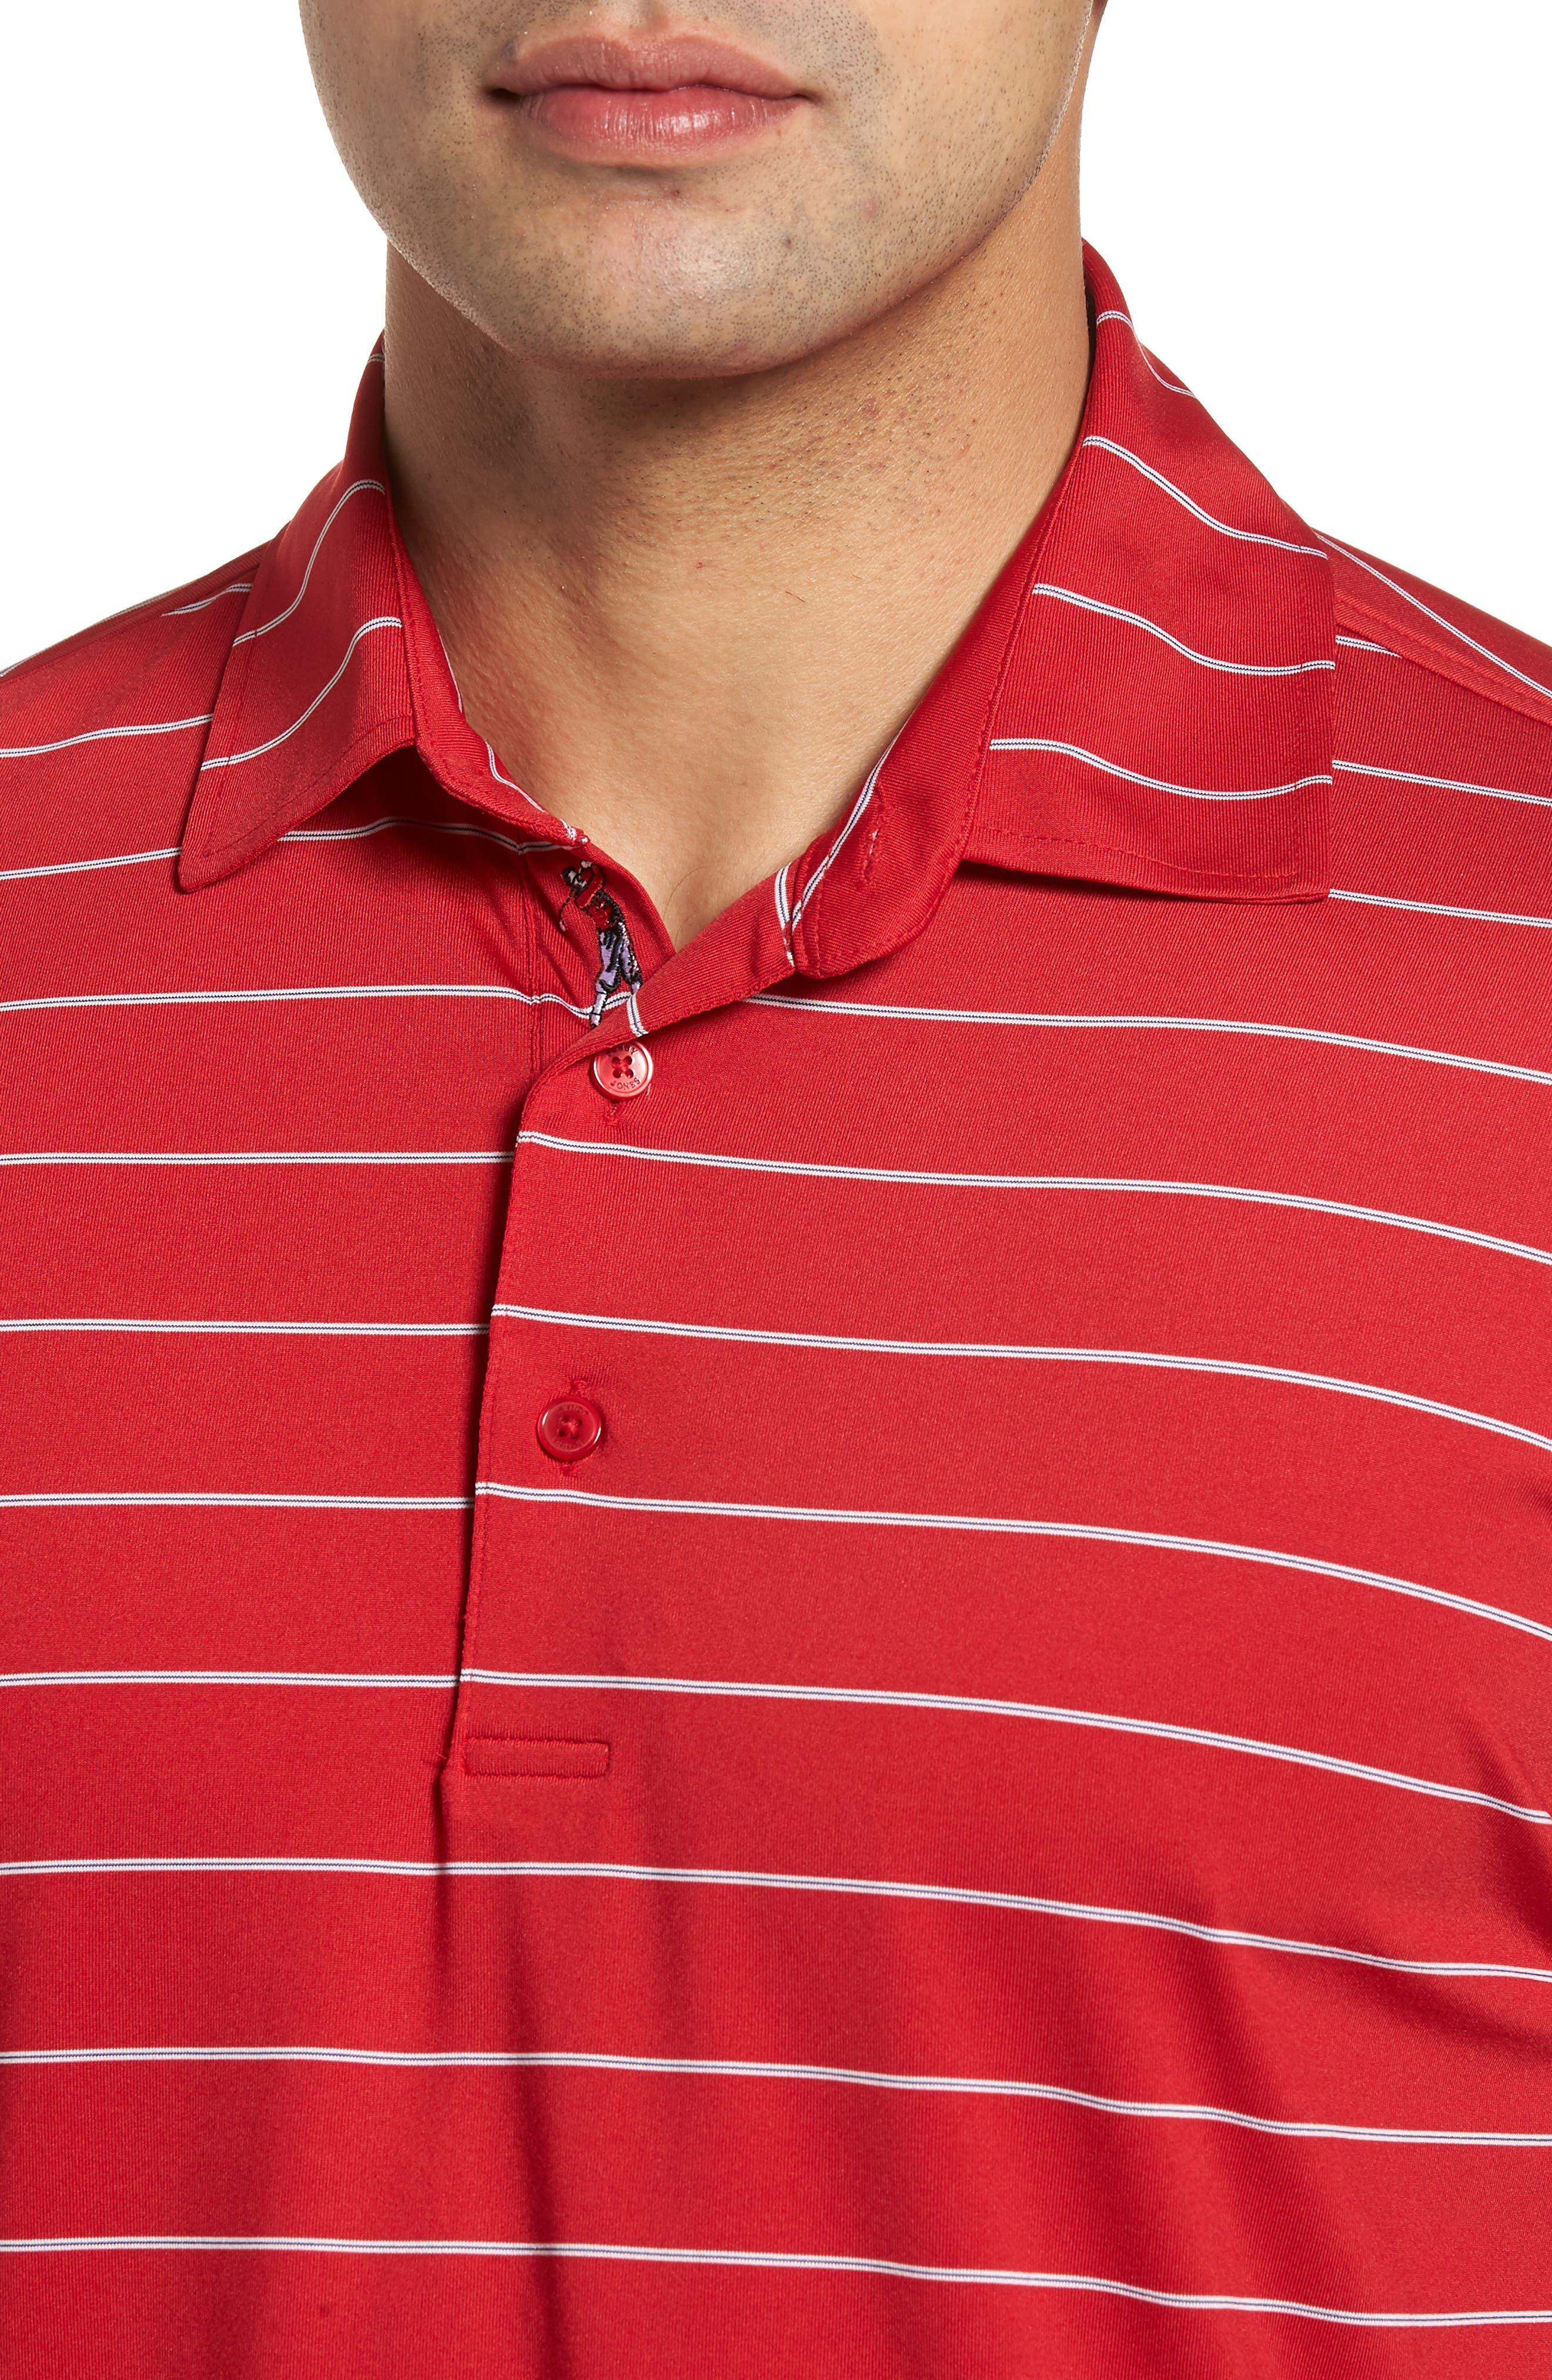 XH2O Momentum Stripe Jersey Polo,                             Alternate thumbnail 4, color,                             Cambridge Red